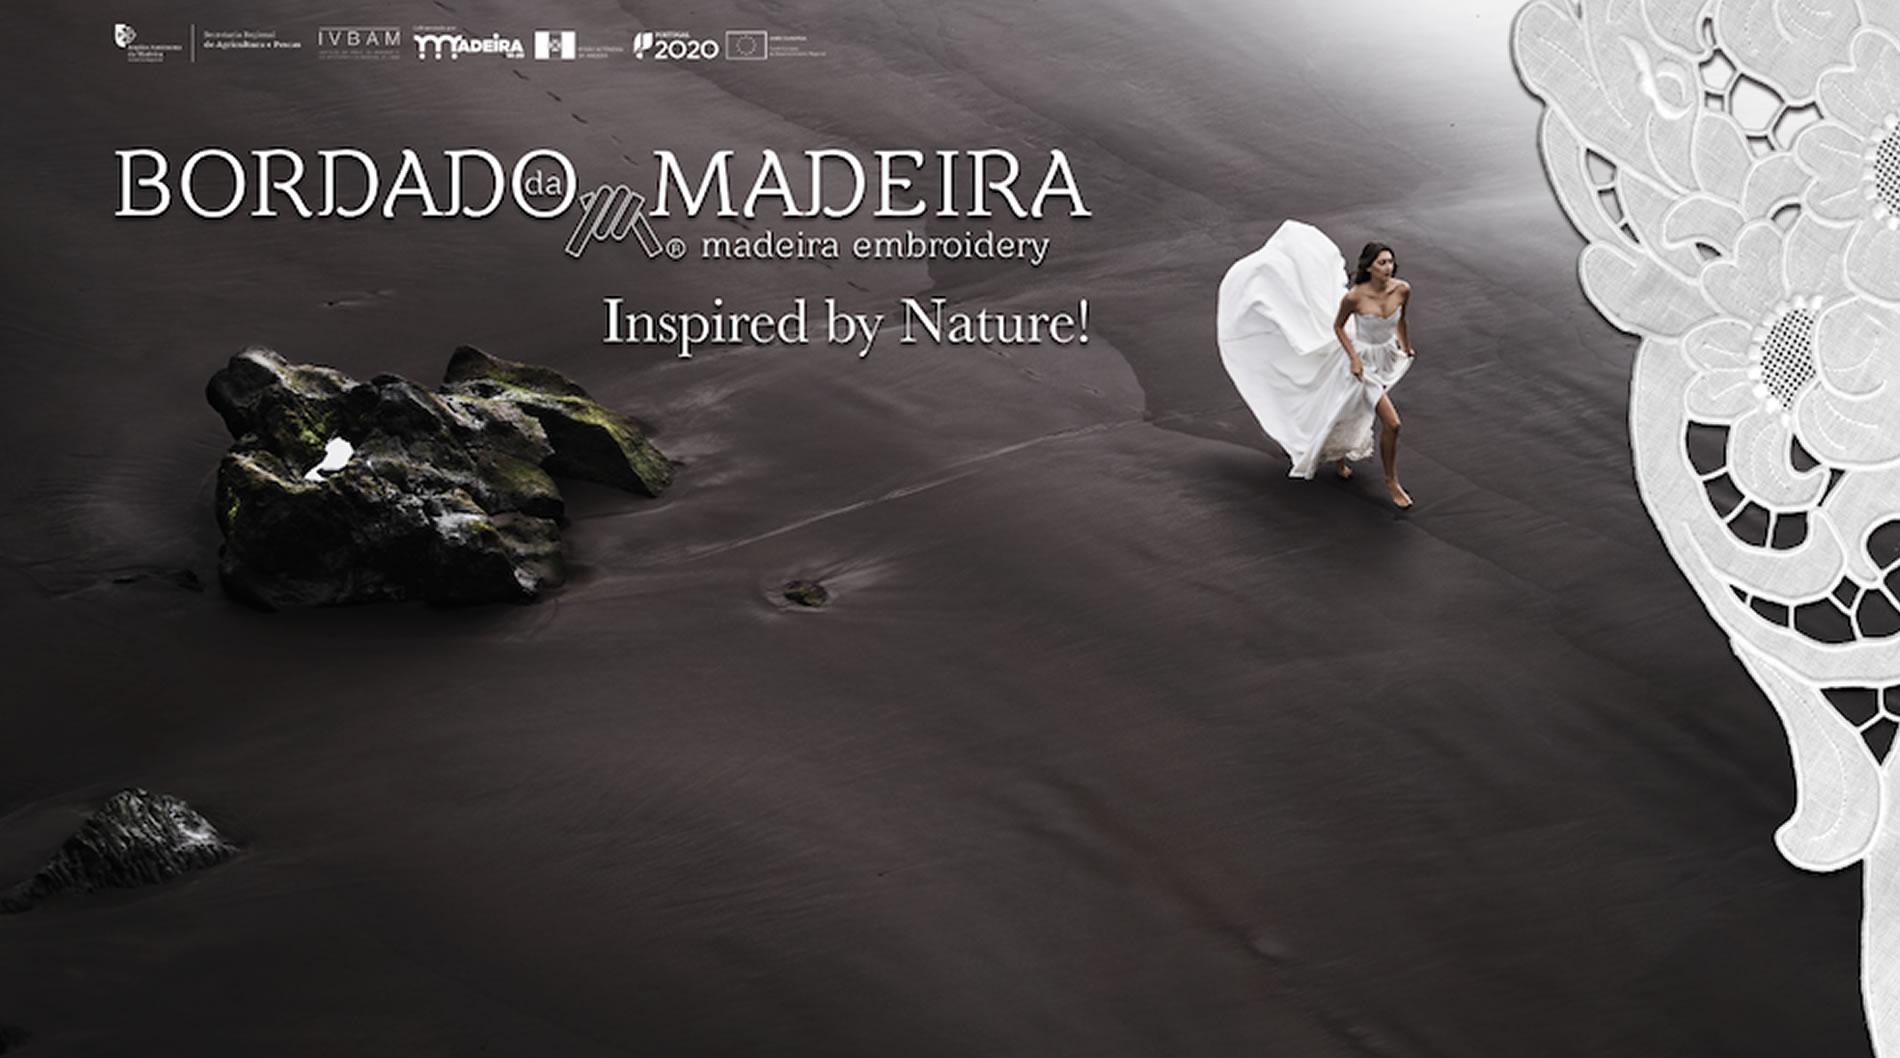 bordado_site_title